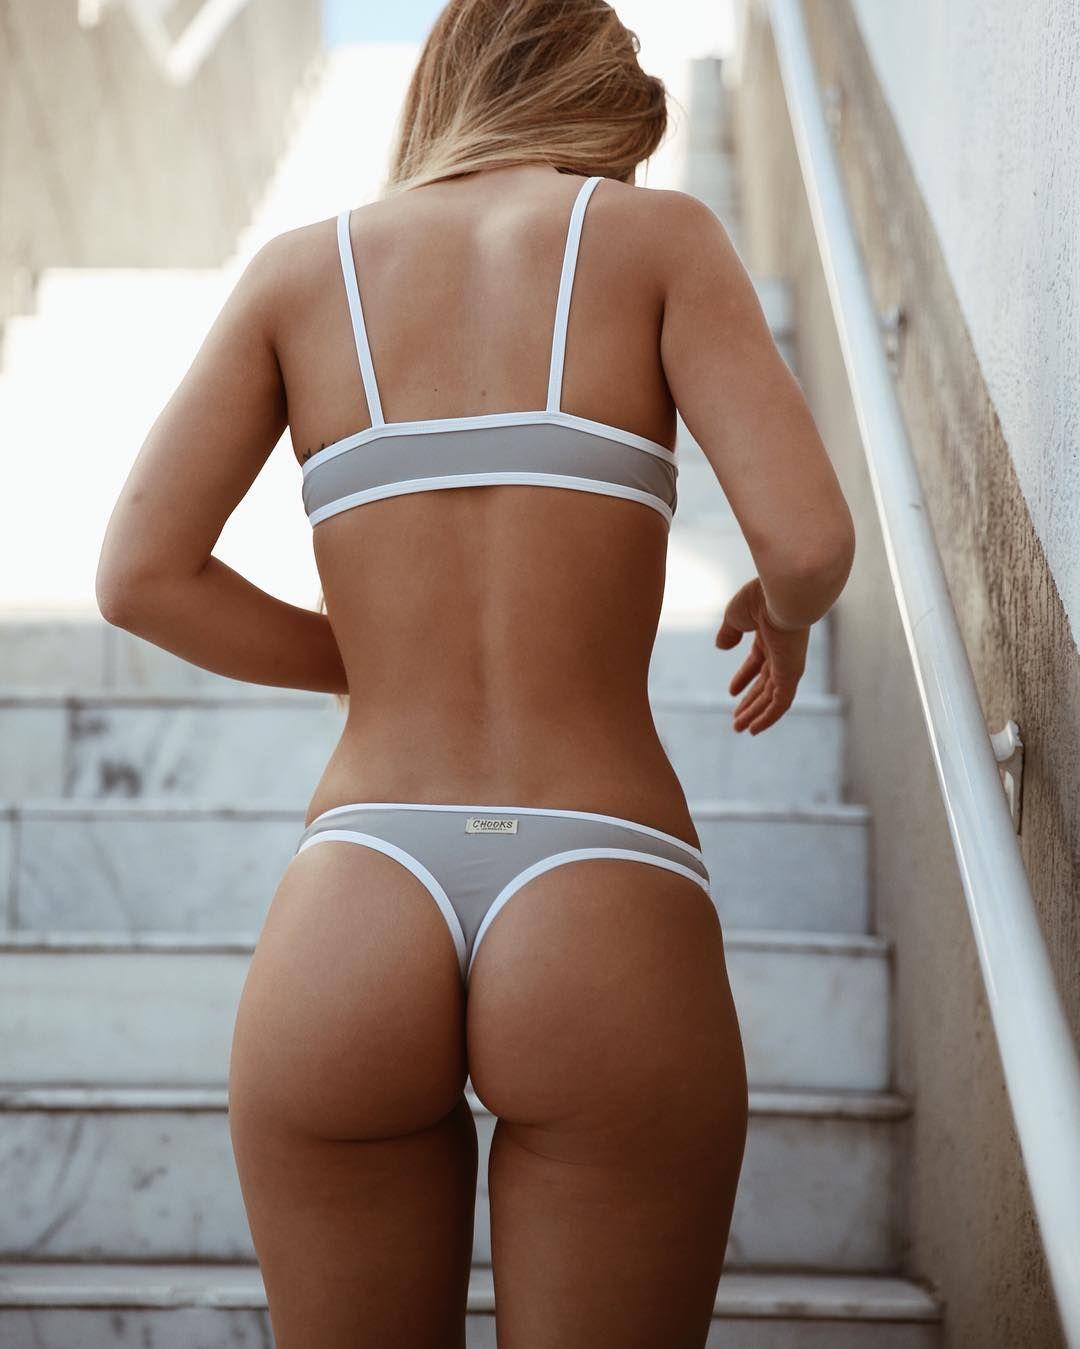 Discount Womens Scrunch Butt And Pucker Butt Thong Bikini And Brazilian Bikinis And Swimwear